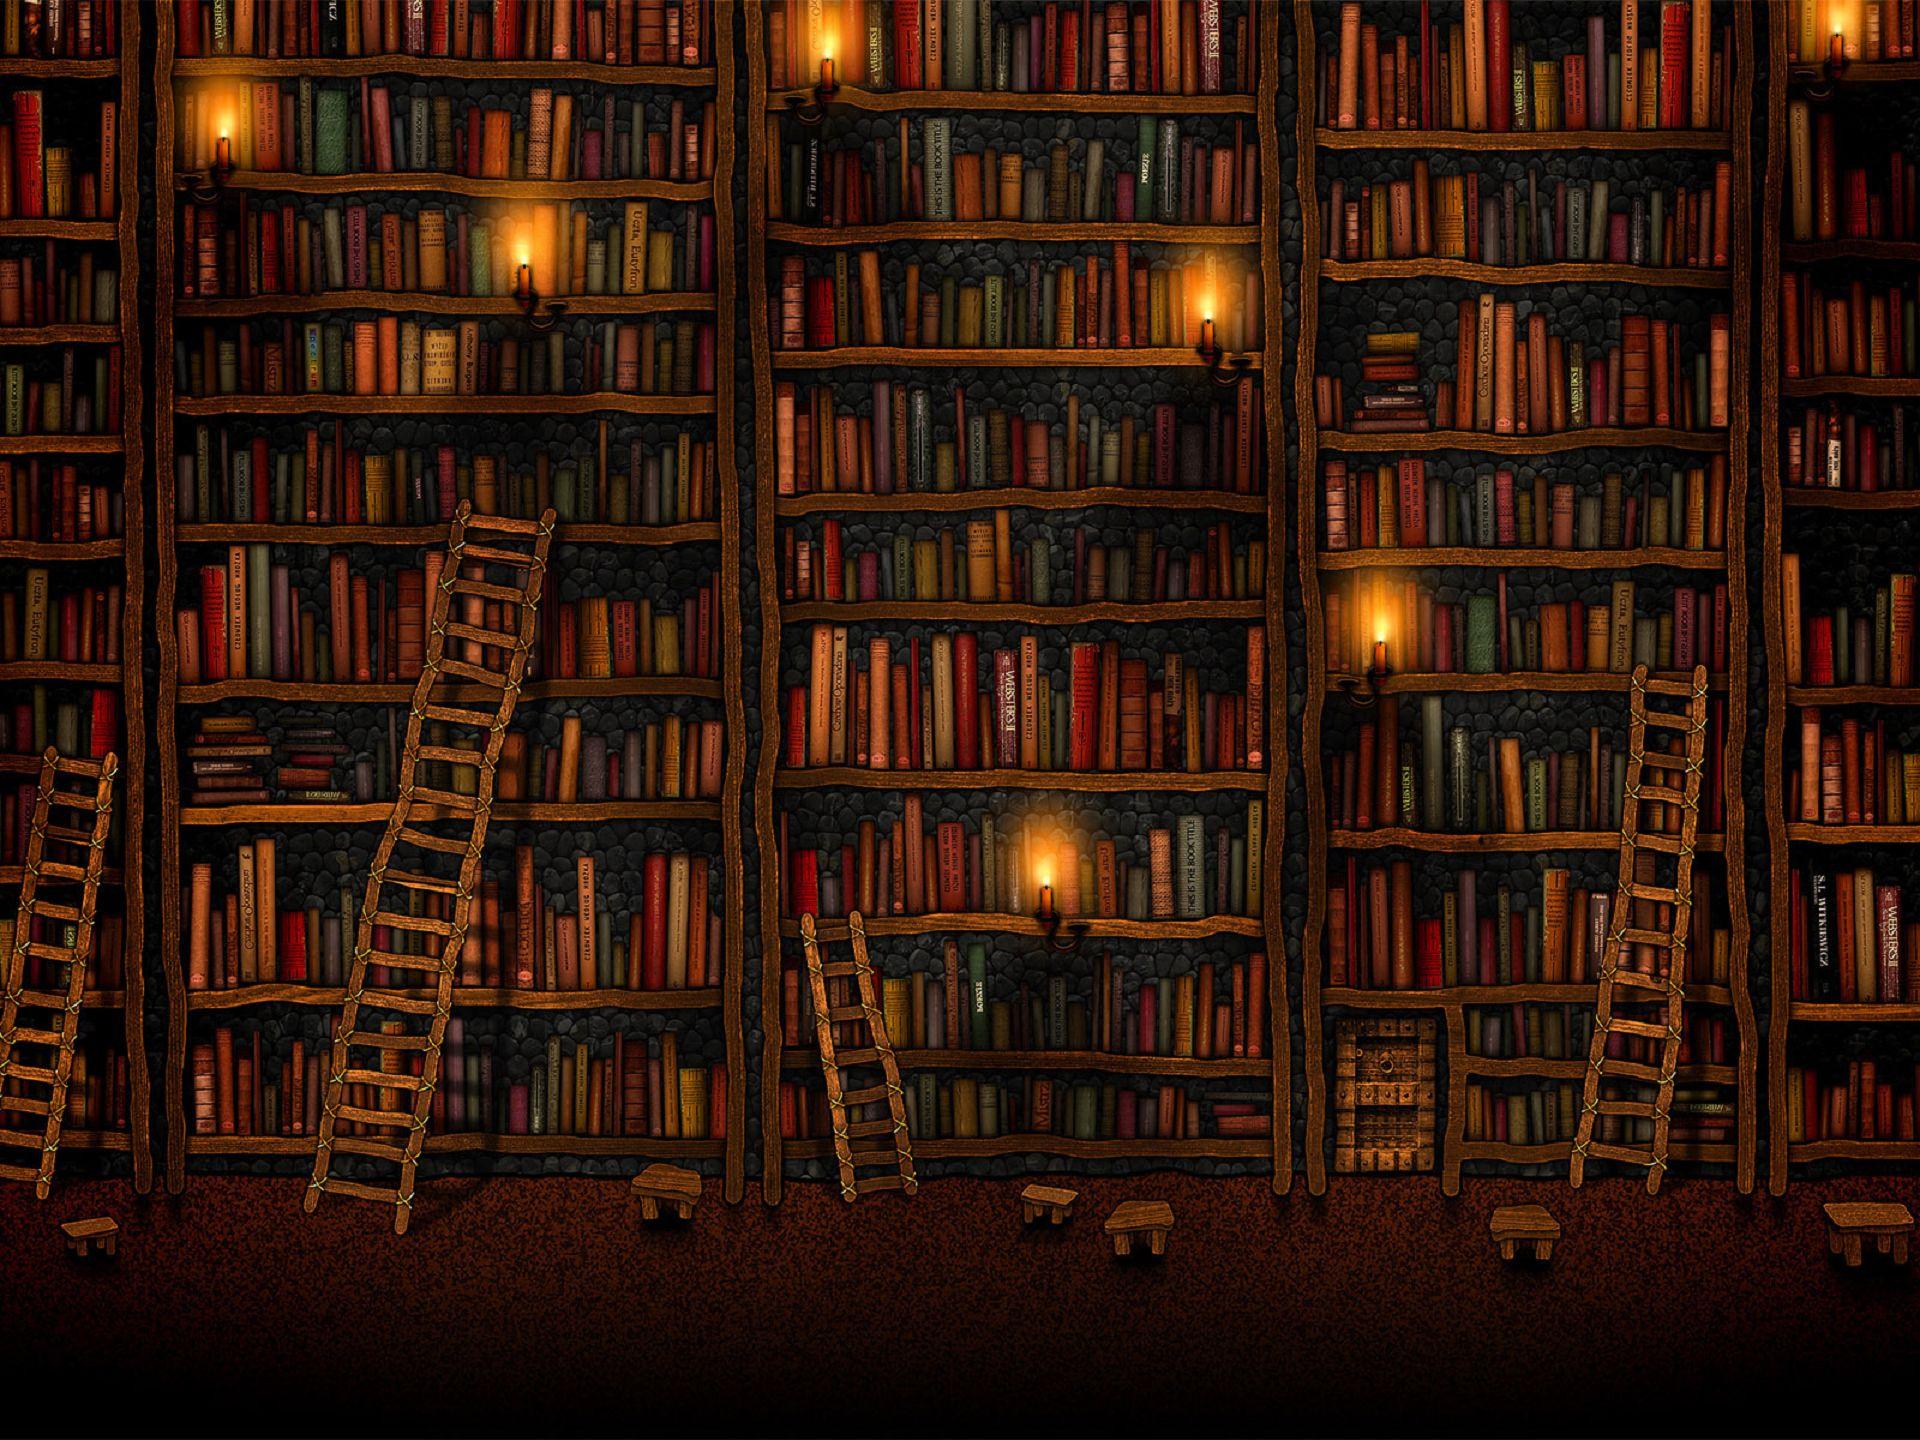 bibliogif biblioth que d 39 images livres bougies myst res. Black Bedroom Furniture Sets. Home Design Ideas